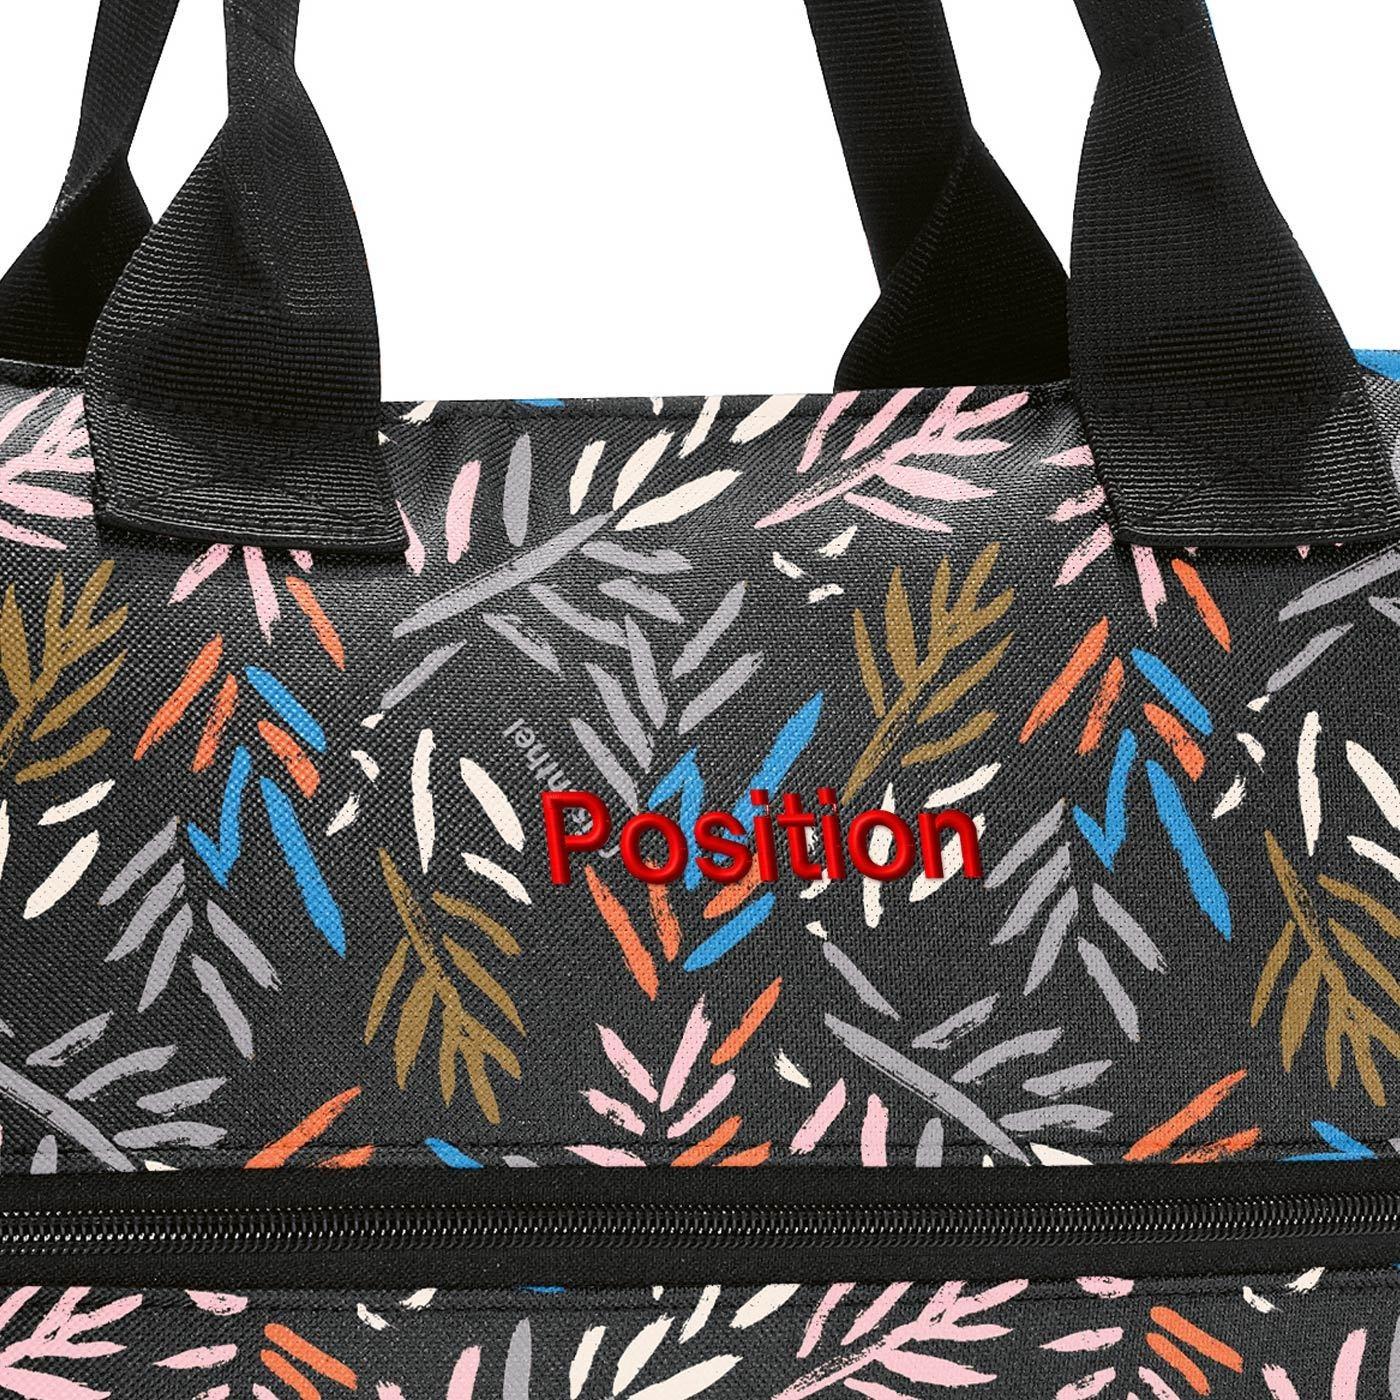 Chytrá taška přes rameno Shopper e1 autumn 1_2